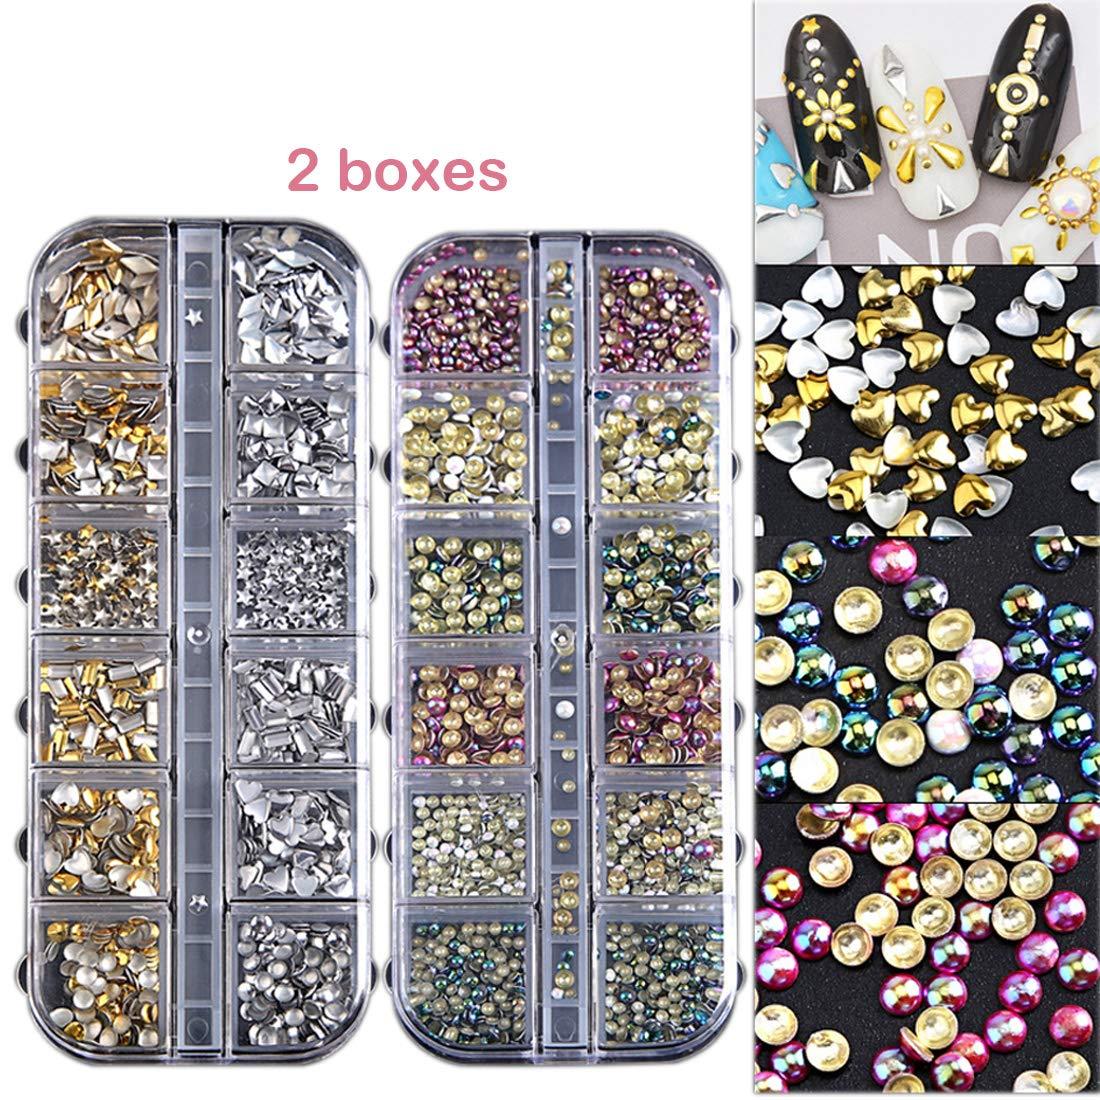 2 Boxes Nail Rhinestones Kit Mixed Sizes DIY Metallic 3D Nail Rivets Studs Colorful Nail Art Charm Decoration by Miss Callory